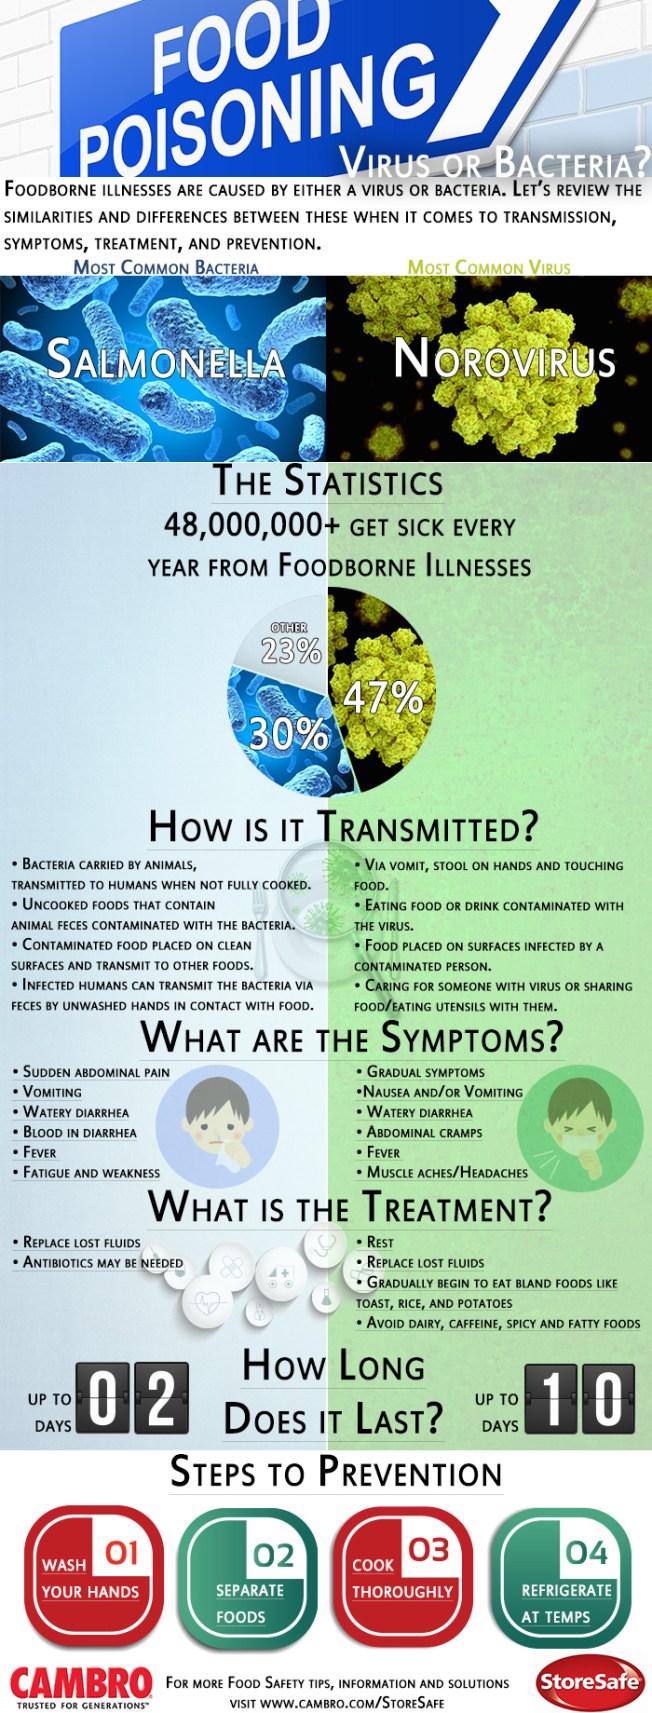 Foodborne Illness Bacteria Or Virus: Cambro Blog